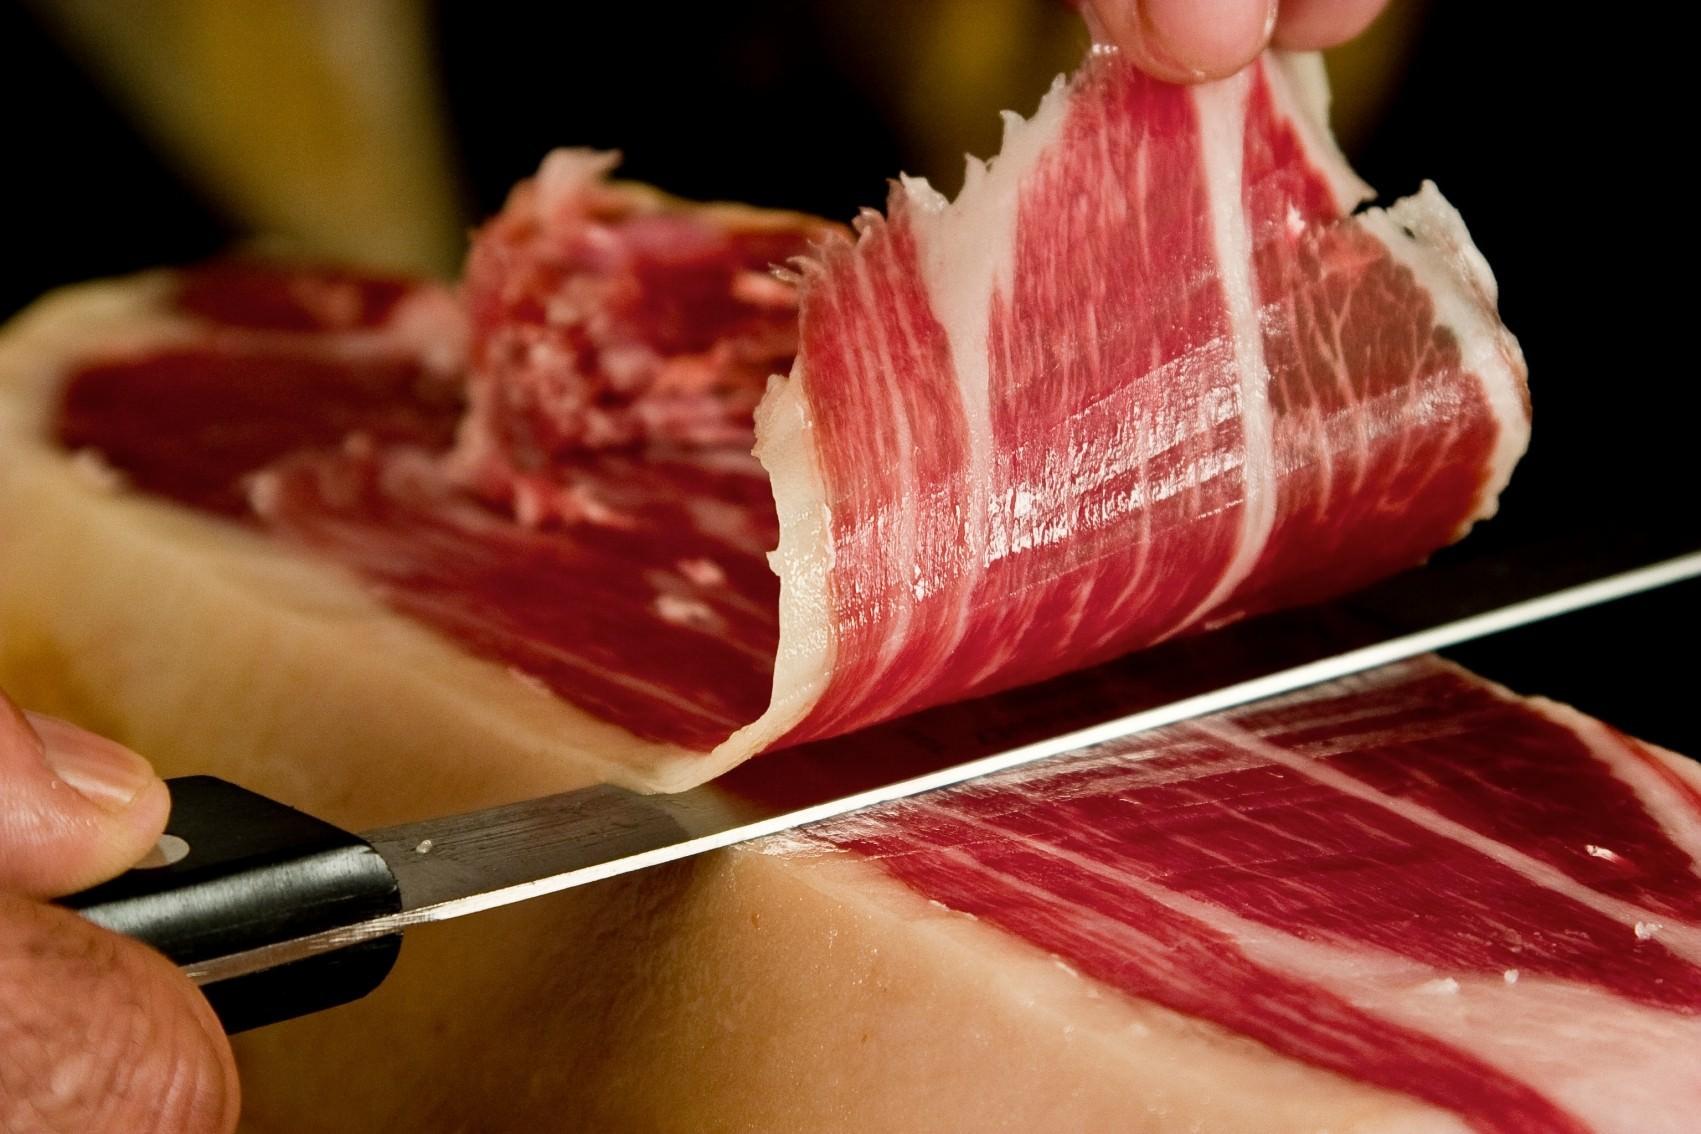 cutting beef slice in a Hanoi hotel restaurant